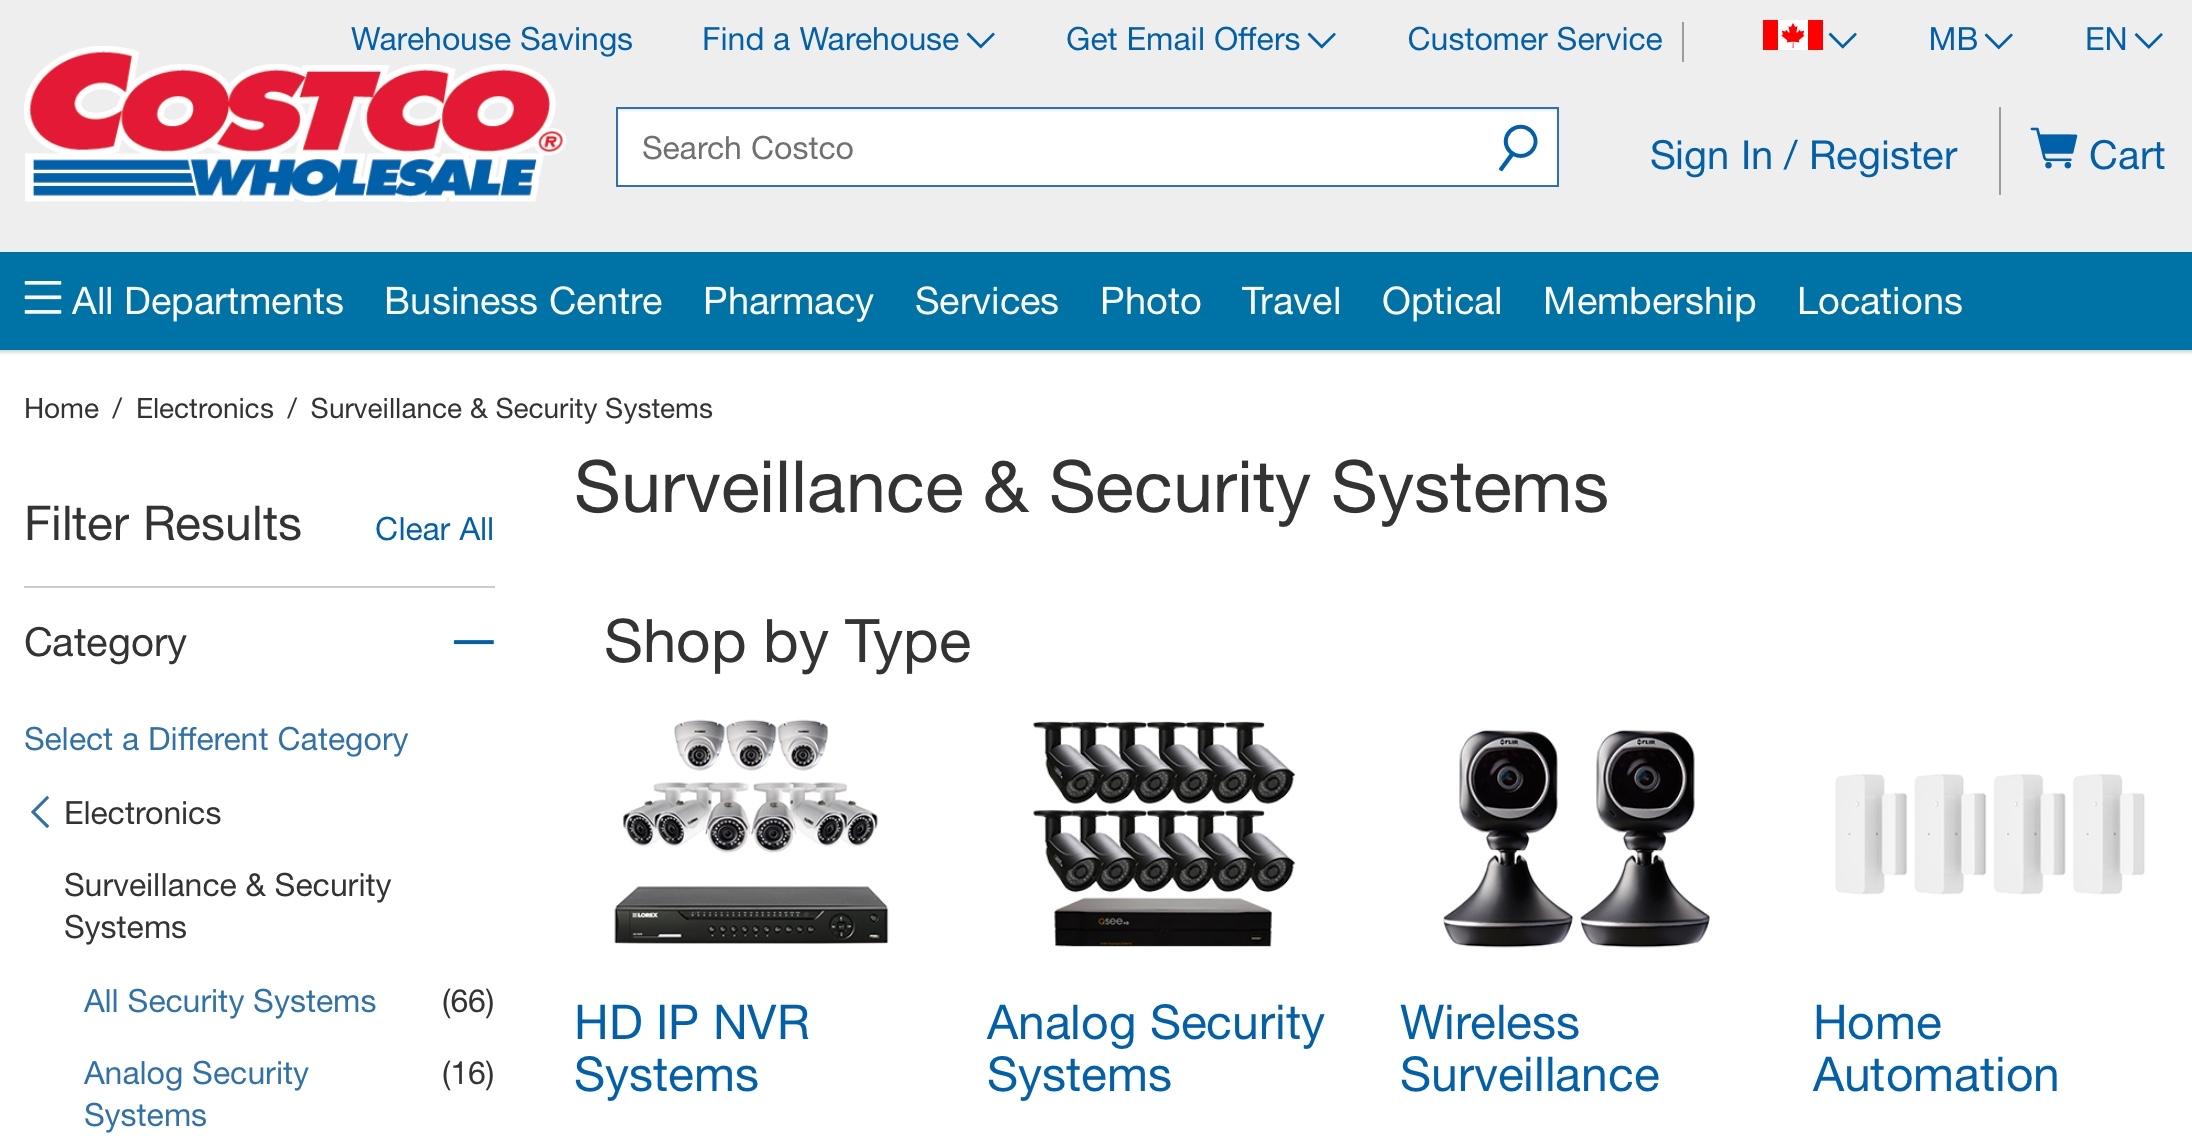 Tip #8 - You can install video surveillance cameras